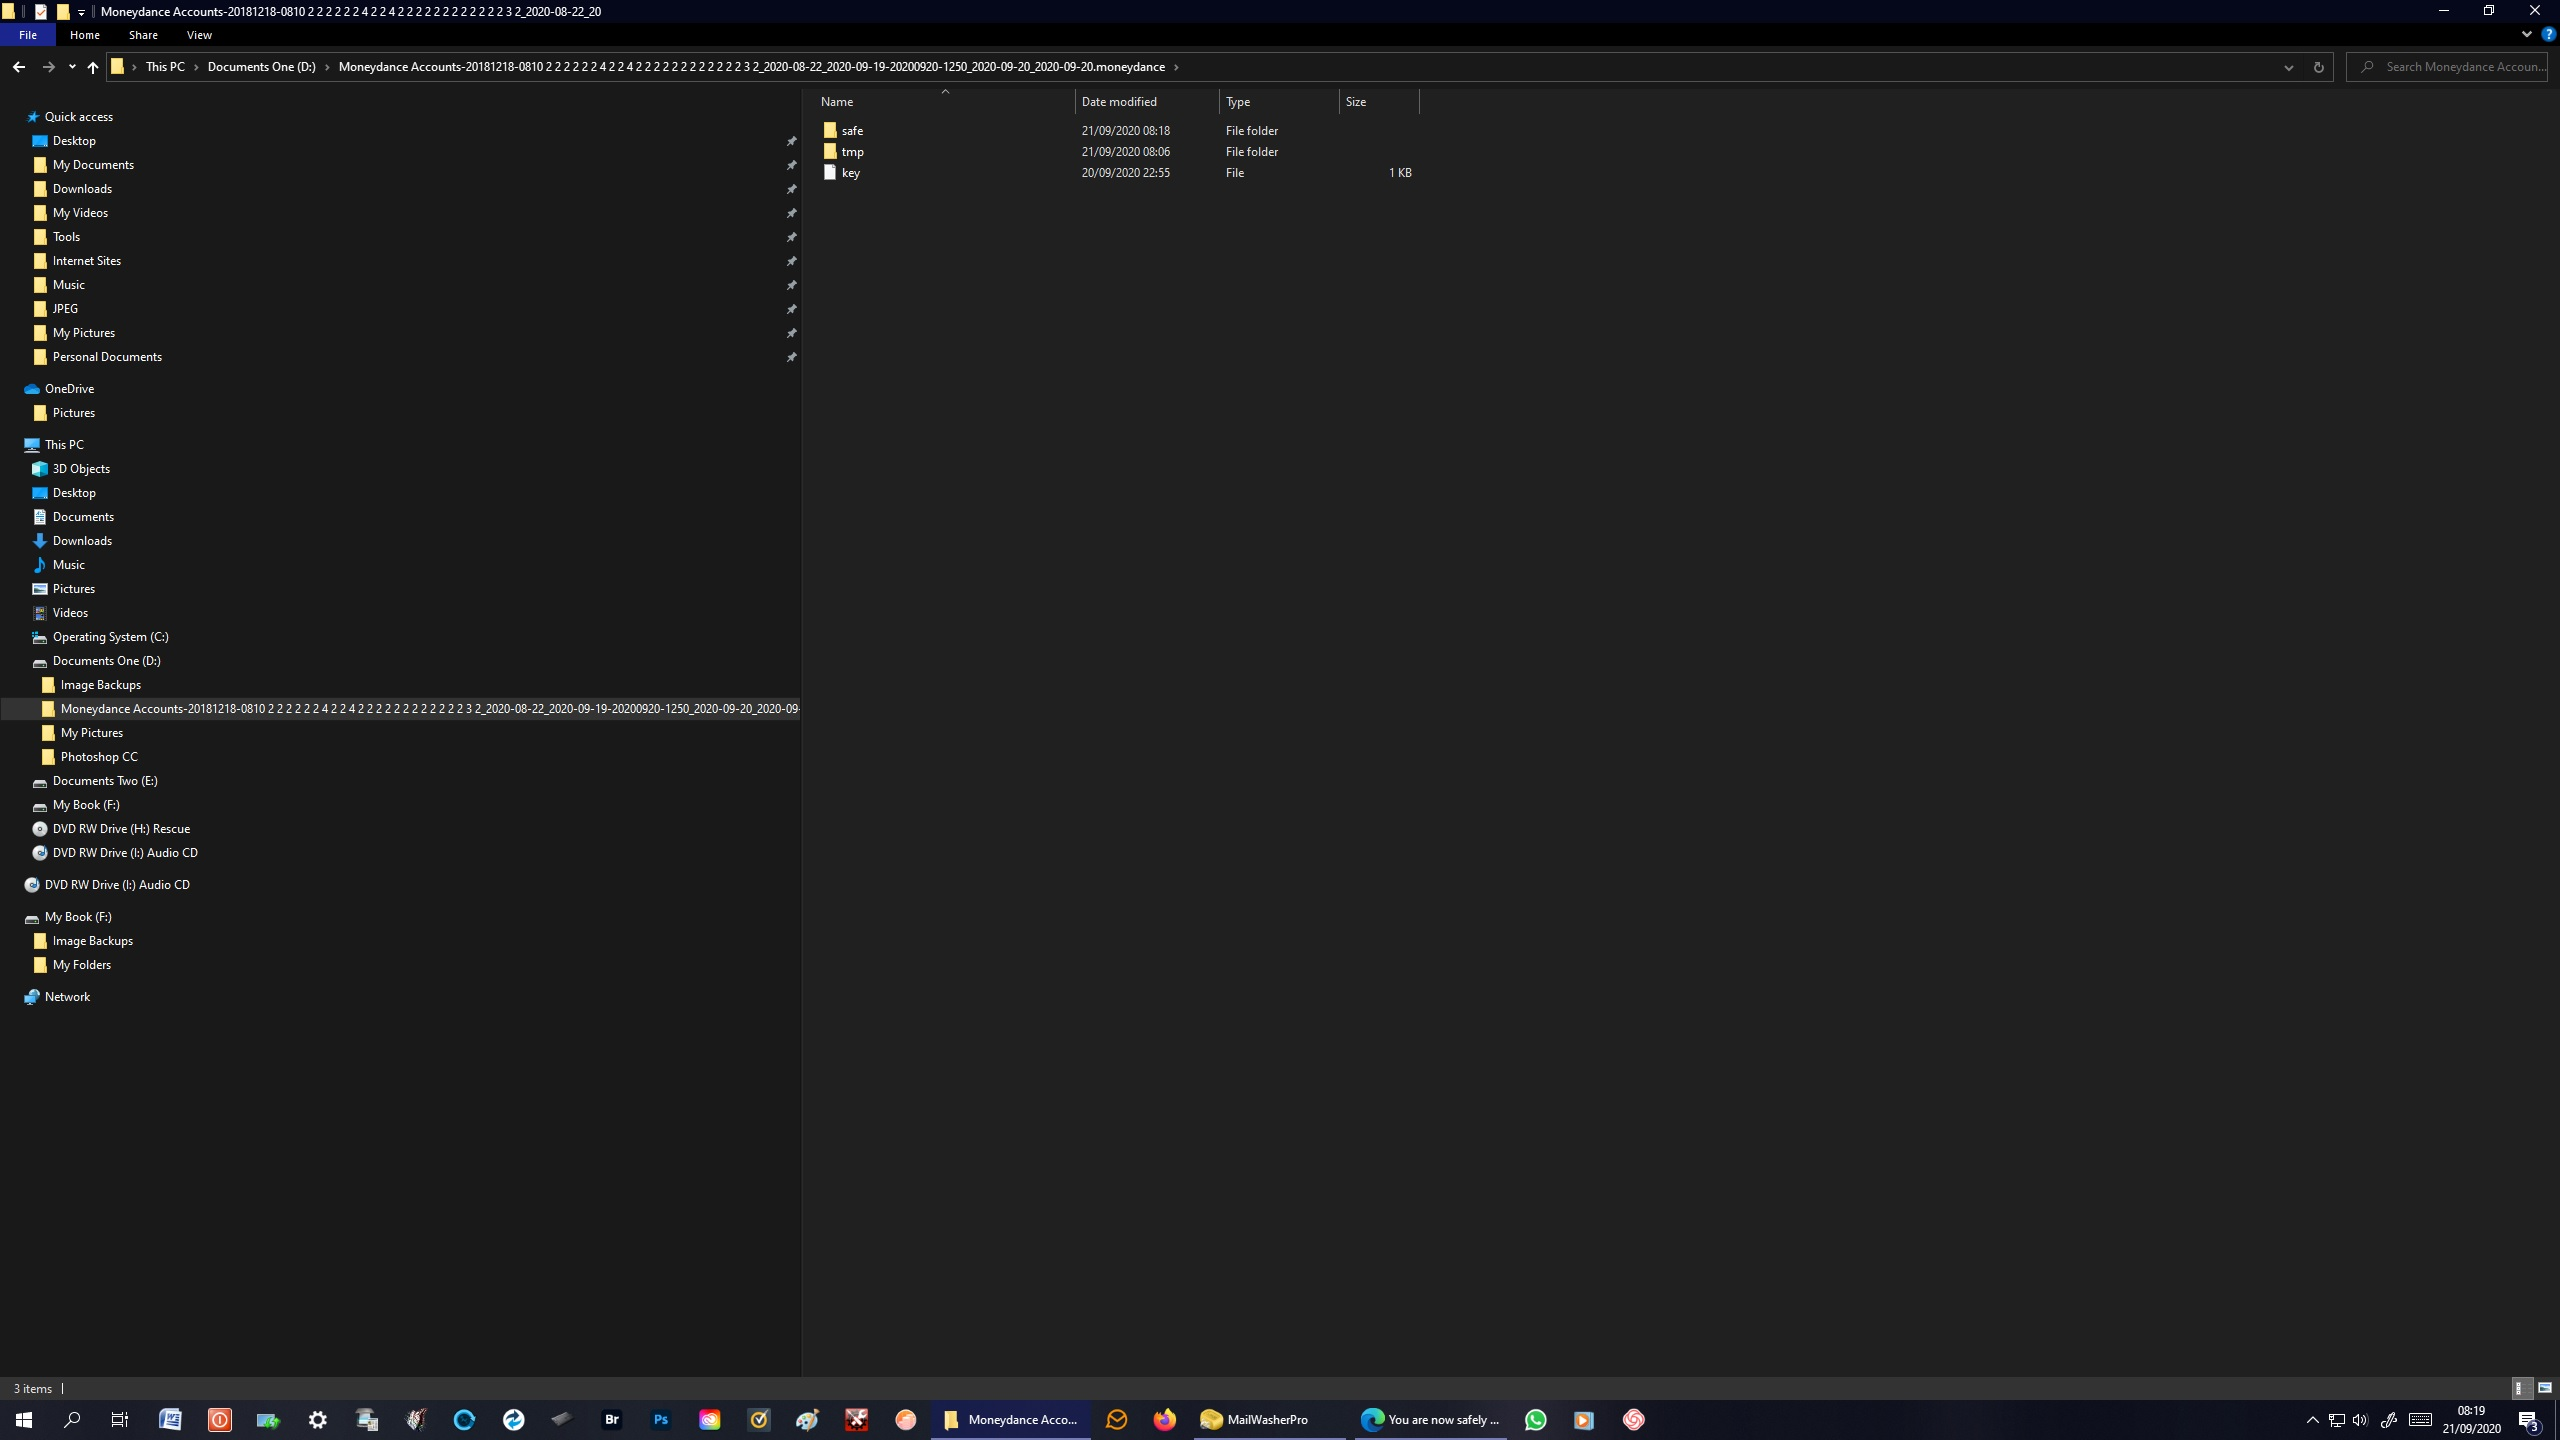 Md_data_folder_on_drive_d